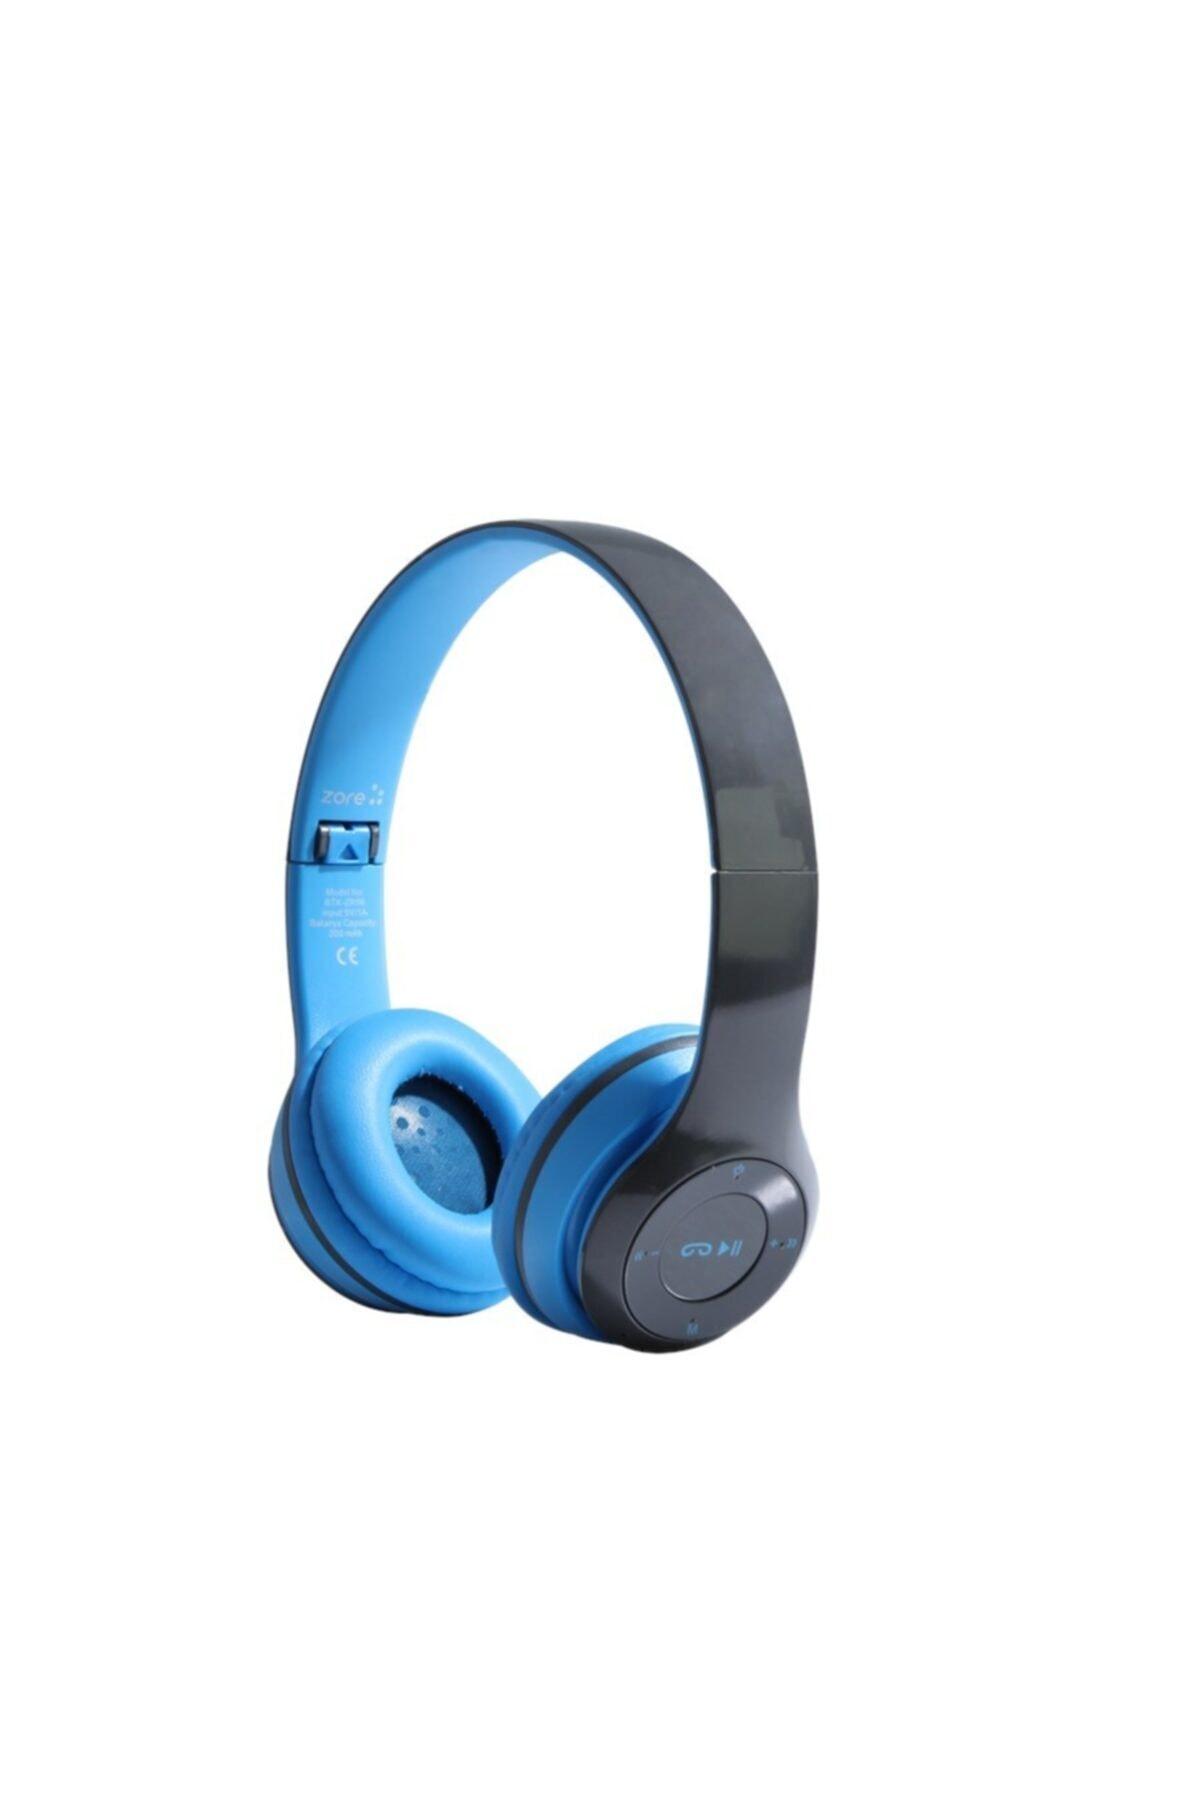 zore Btk-zr56 Uyumlu Bluetooth Kulaklık 1